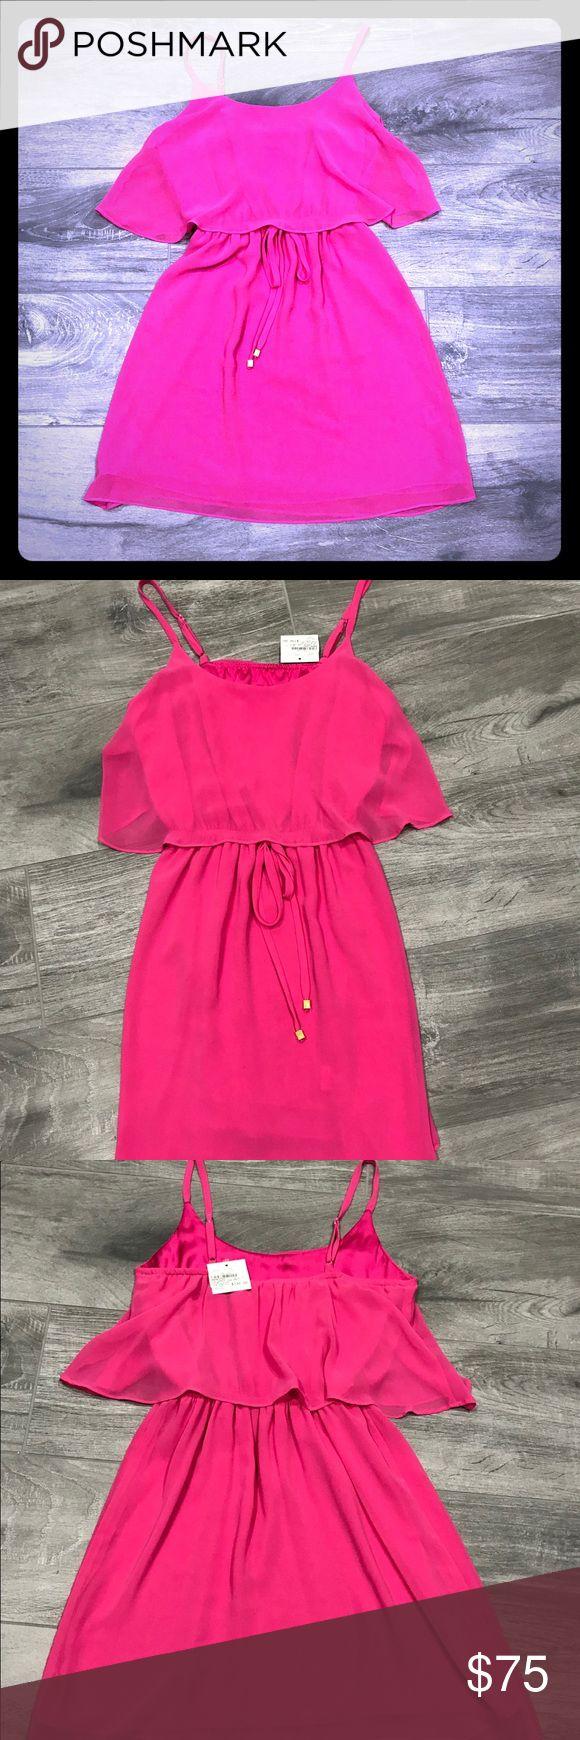 NWT kaya di koko coral pink sundress XS NWT Coral pink tank dress with drawstring cinch waist. Has a liner  100% polyester  Adjustable straps  Great for summer or vacation !! kaya di koko Dresses Mini